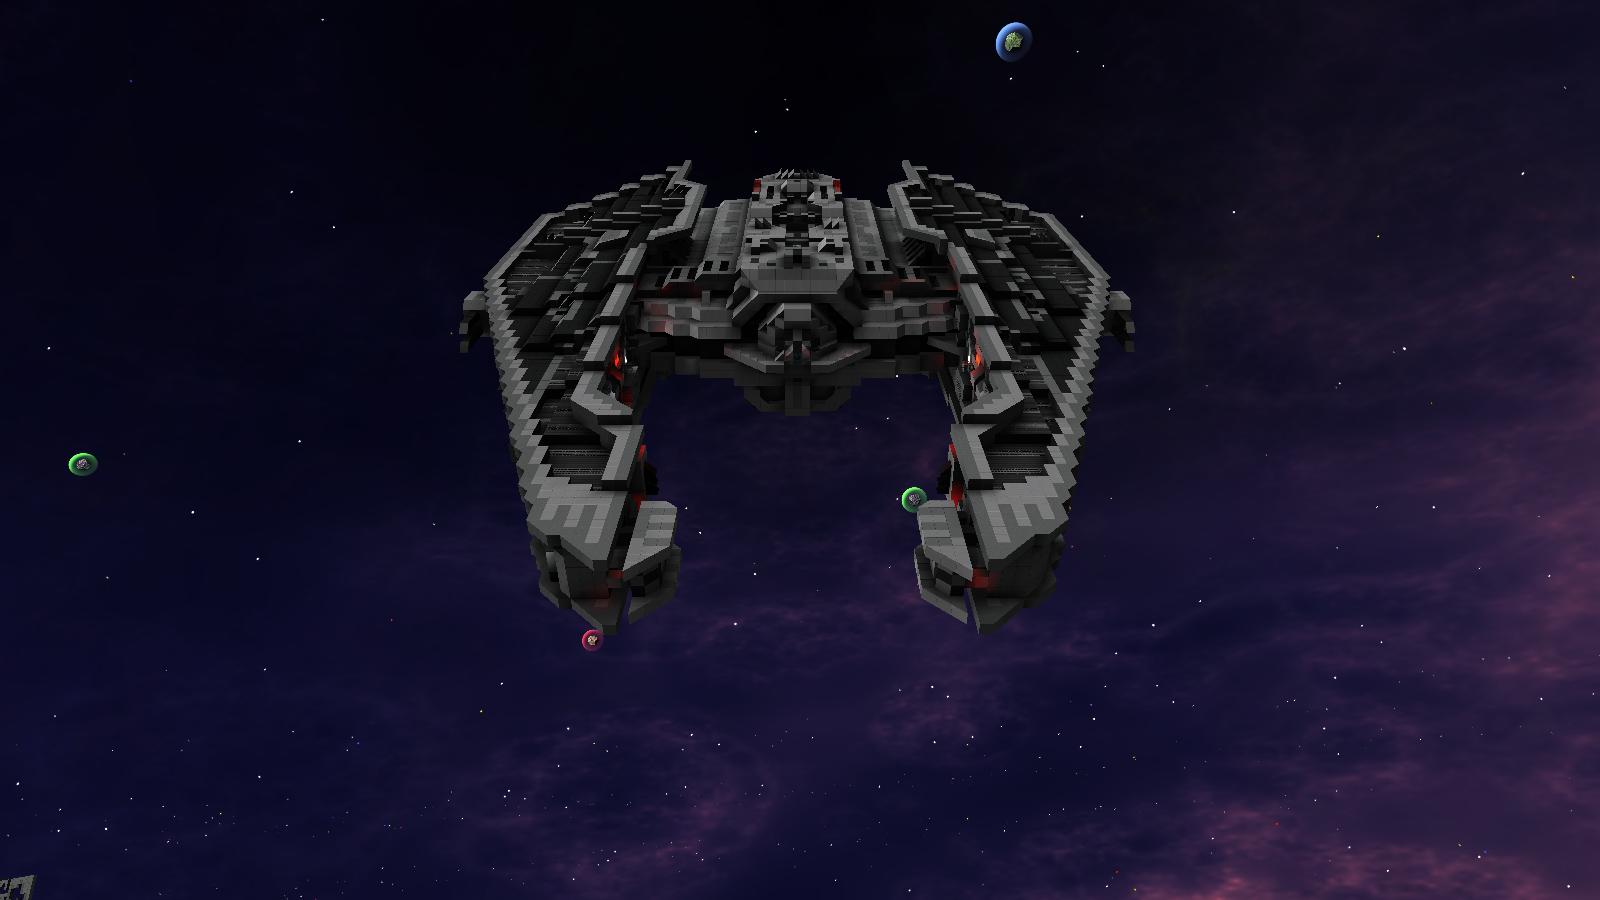 Top 5 StarMade Ships for Fall 2015   EnviousHost Blog   Fall 2015, Fall,  Interceptor